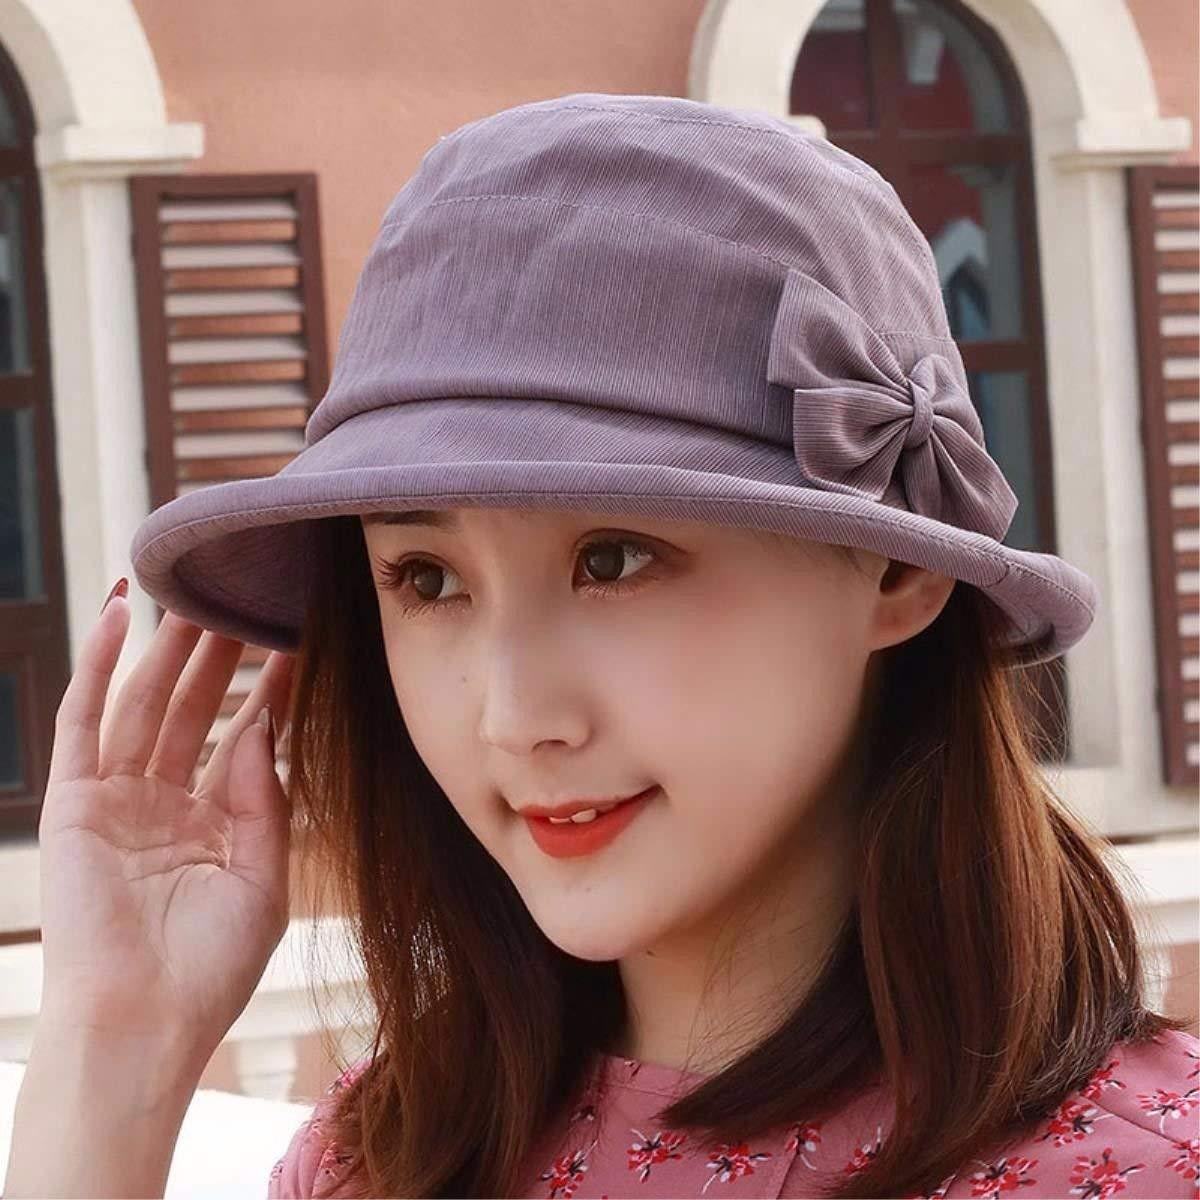 a7600587880 Get Quotations · LONFENN Ladies Women Hats Spring Summer Yarns Cap The Cap  Basin Cap Outdoor Hat Fashion Cap